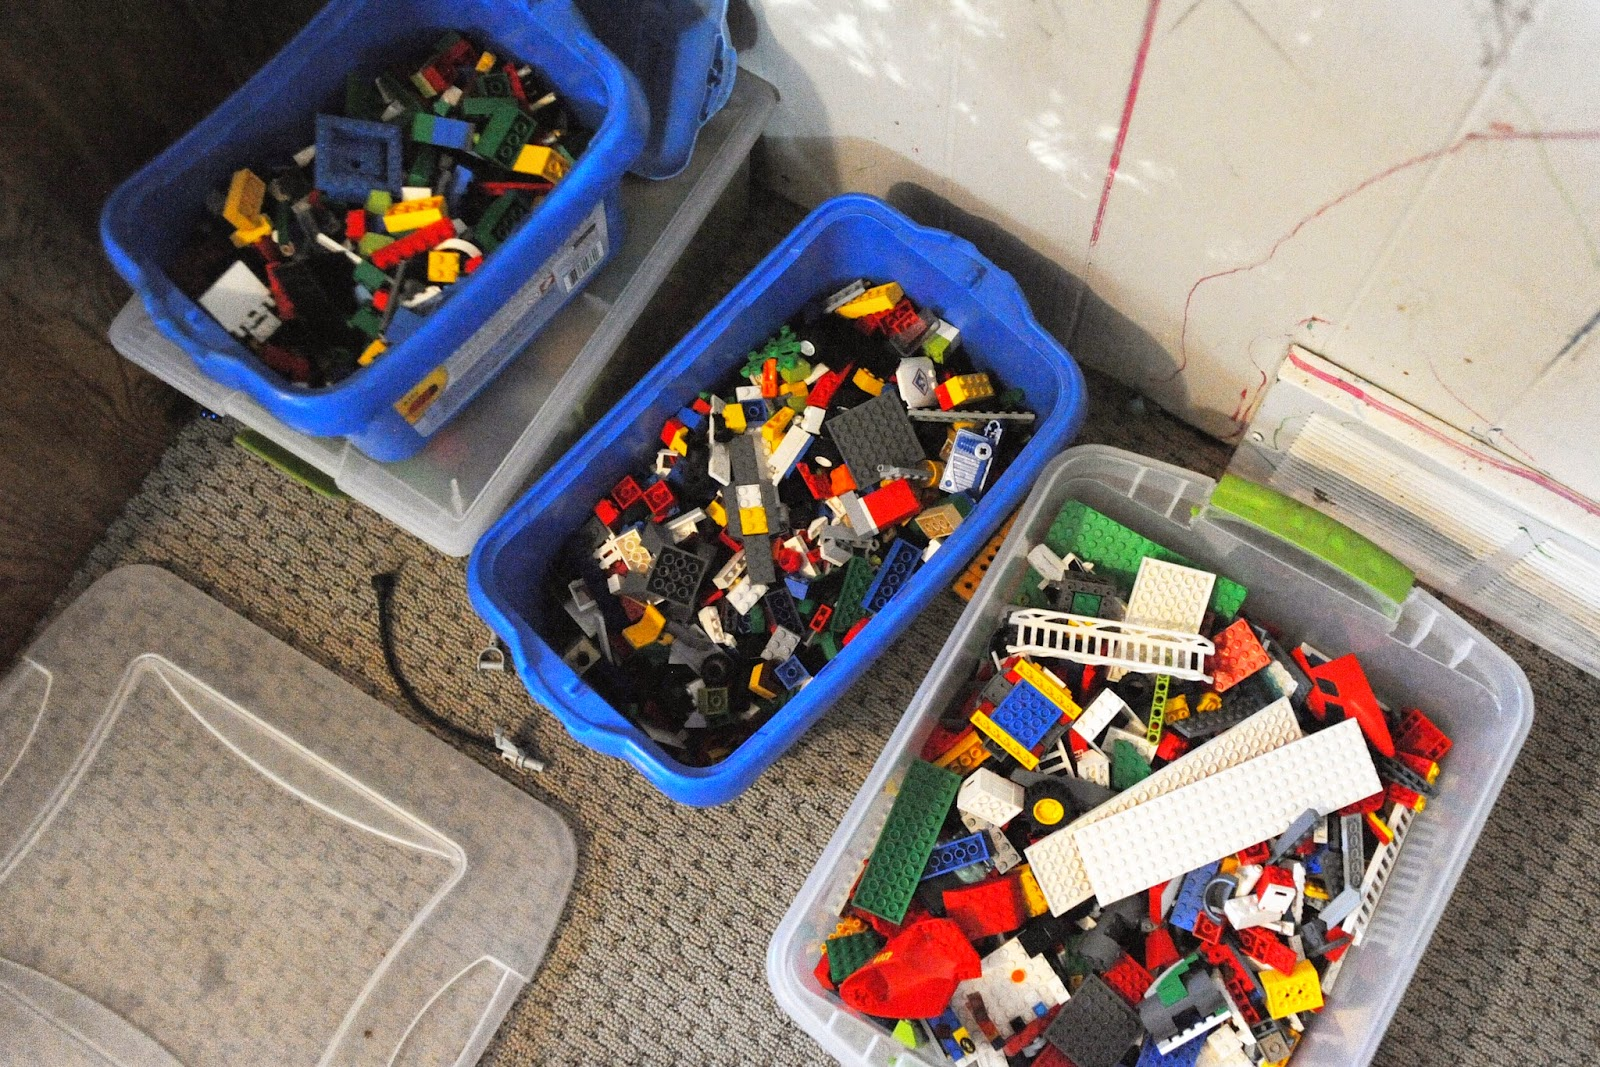 Gunakan 3 Jenis Tempat Ini Untuk Menyimpan Lego